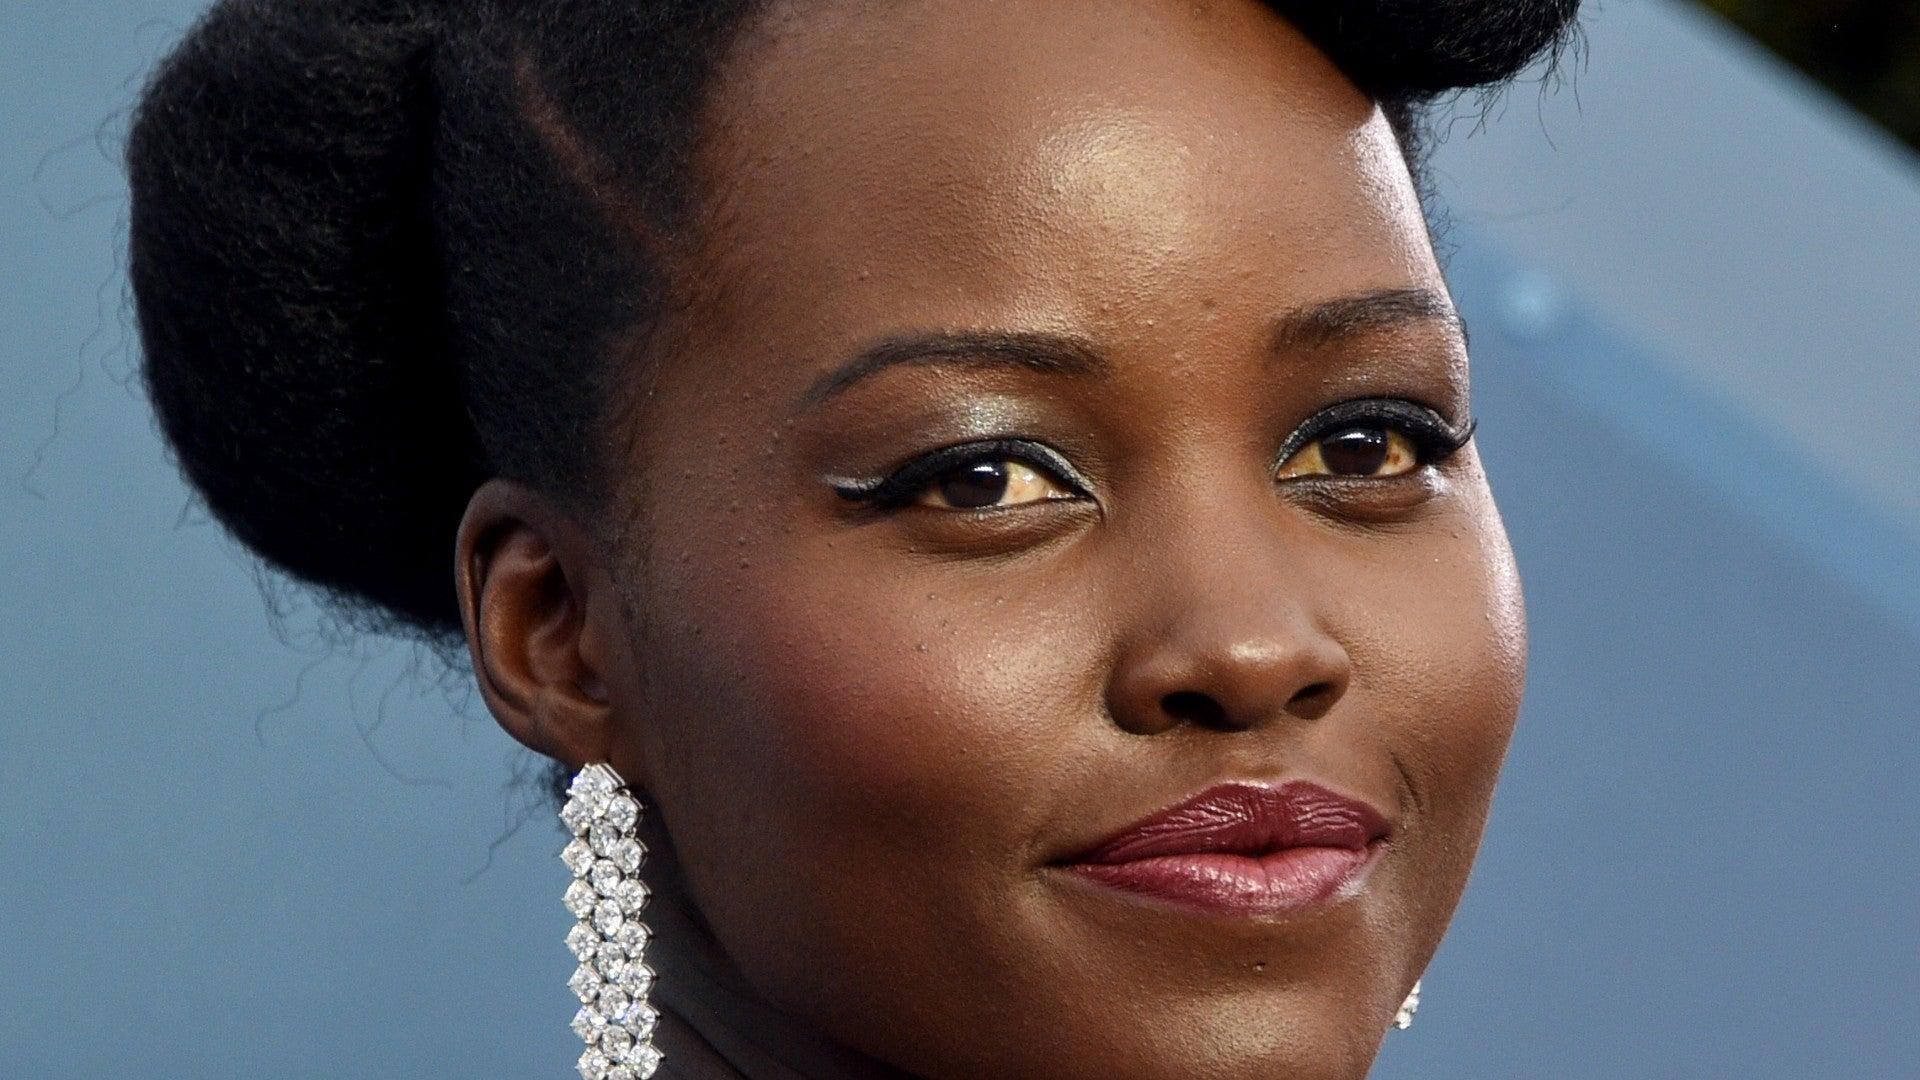 Lupita's Makeup Artist Gives Tips On How To Make Eyeliner Pop On Dark Skin Tones